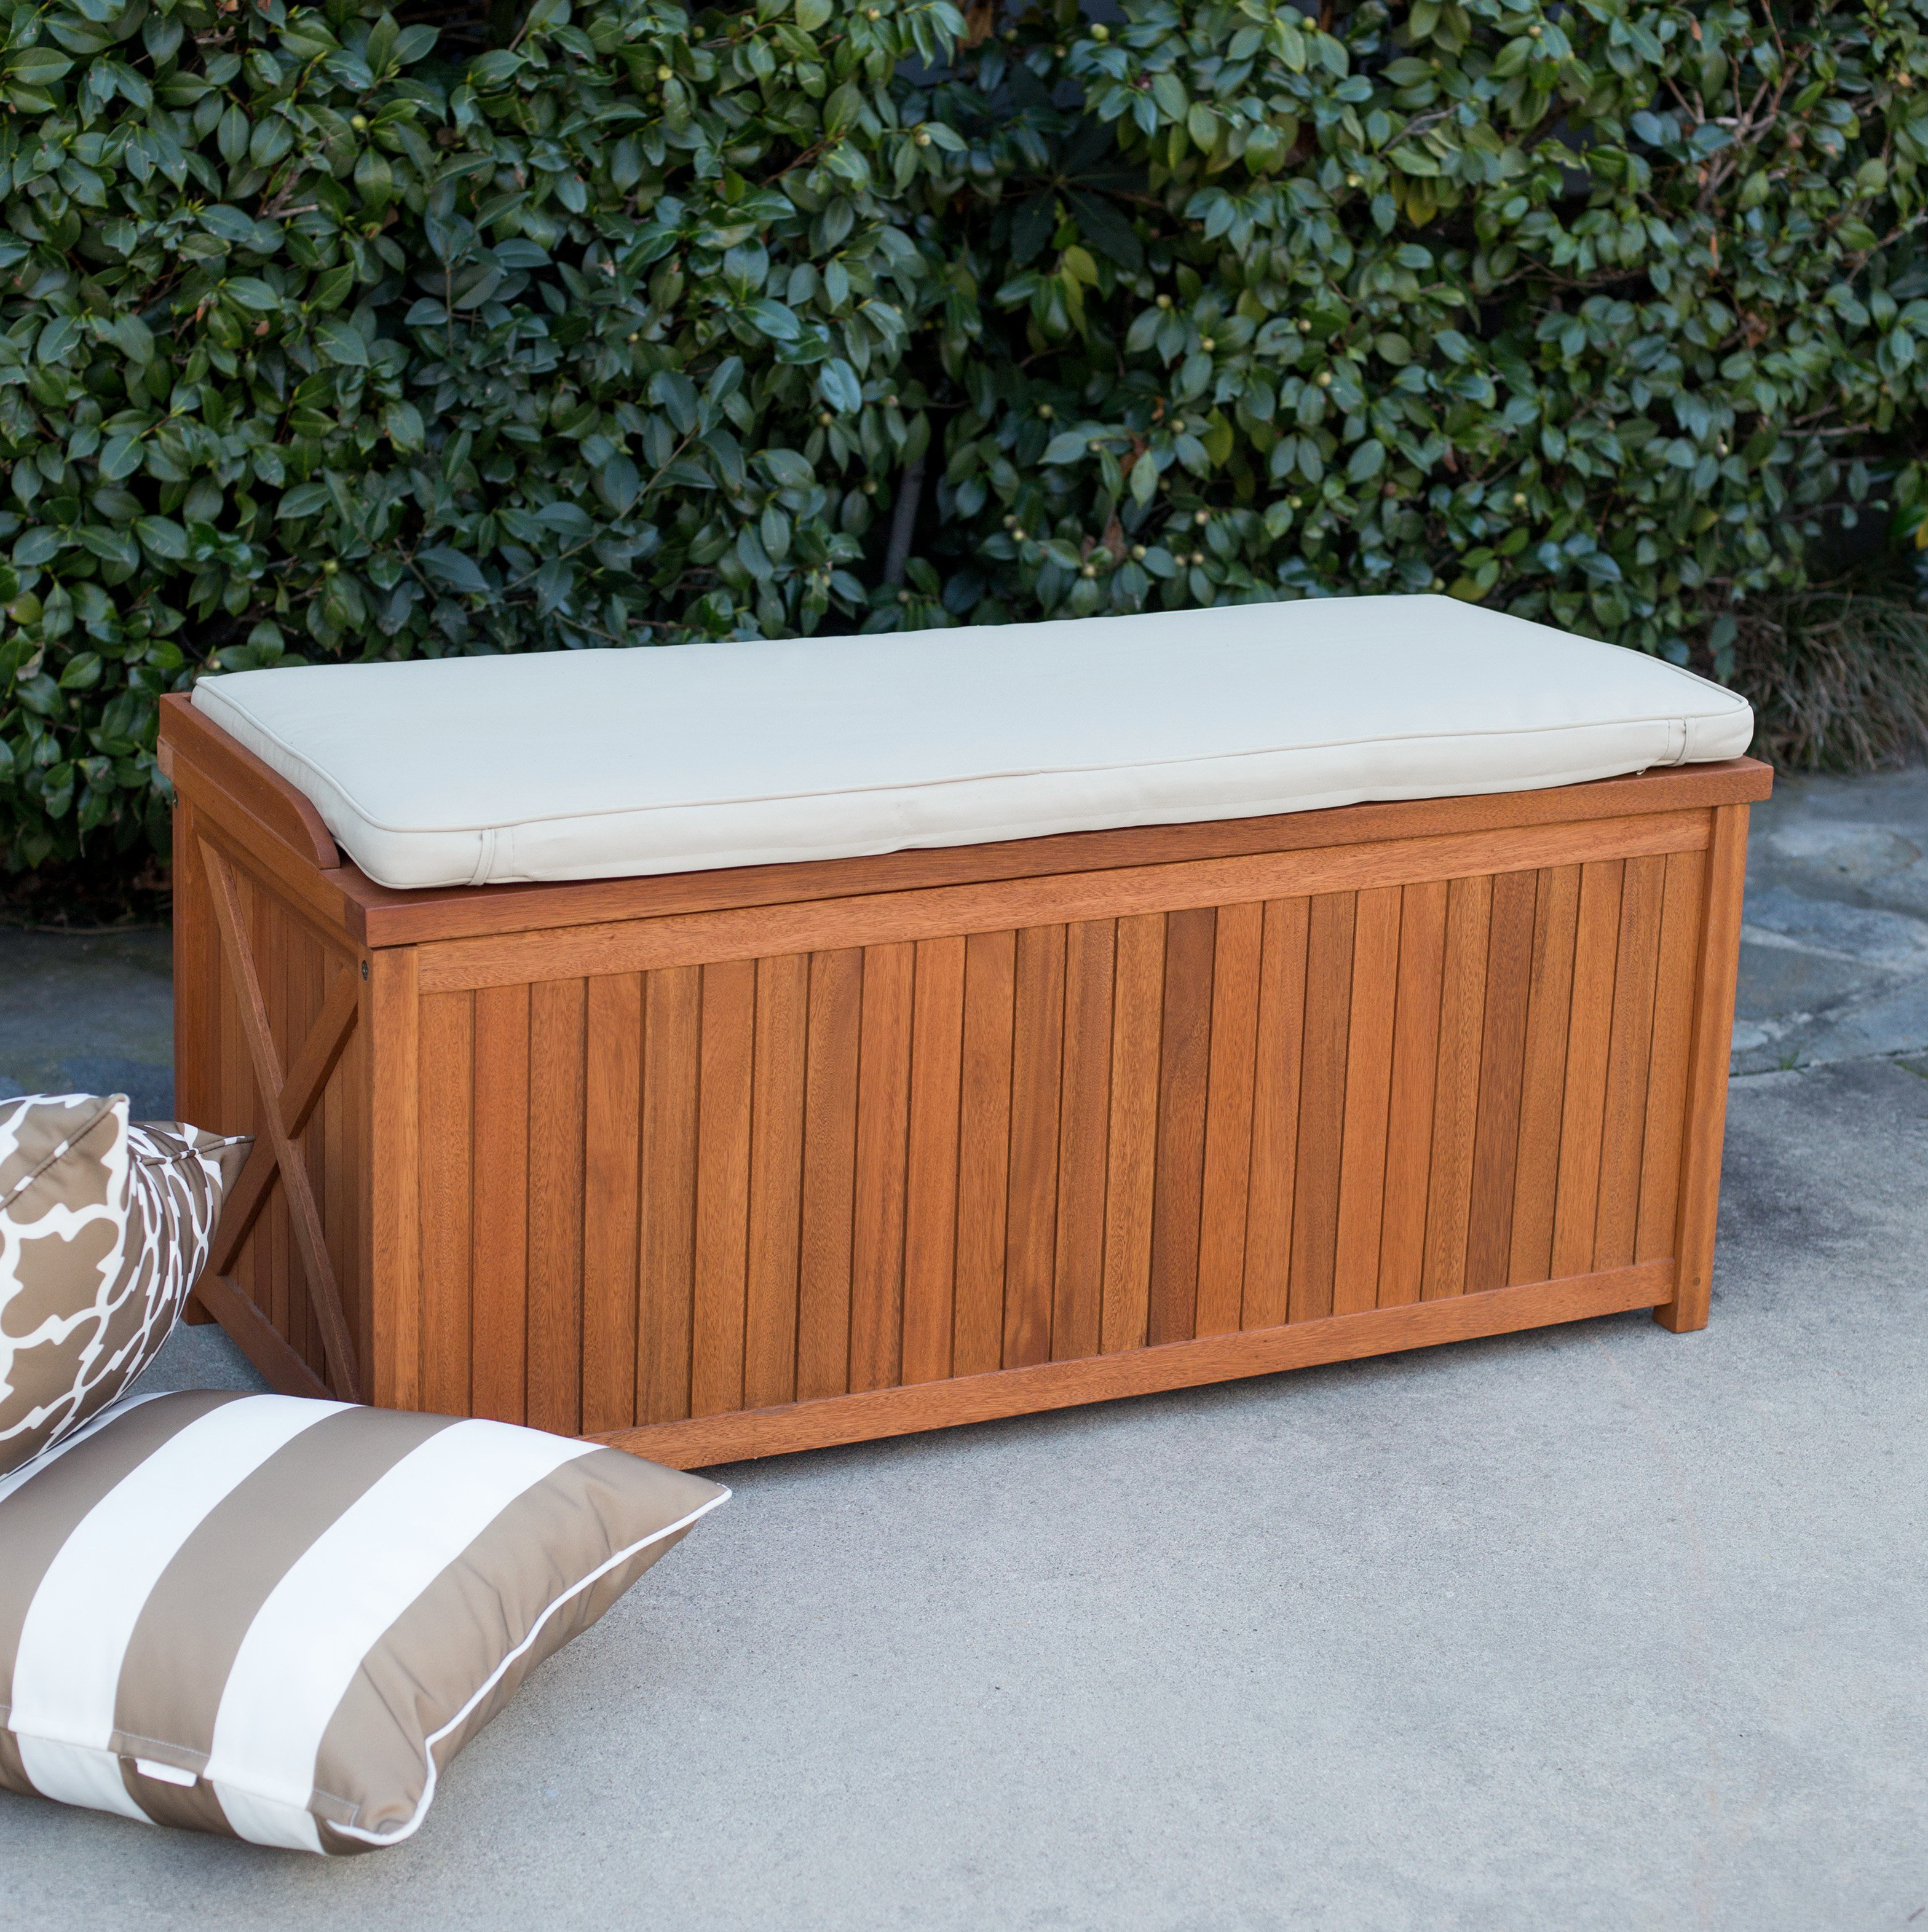 Outdoor Cushion Storage Box Home Design Ideas